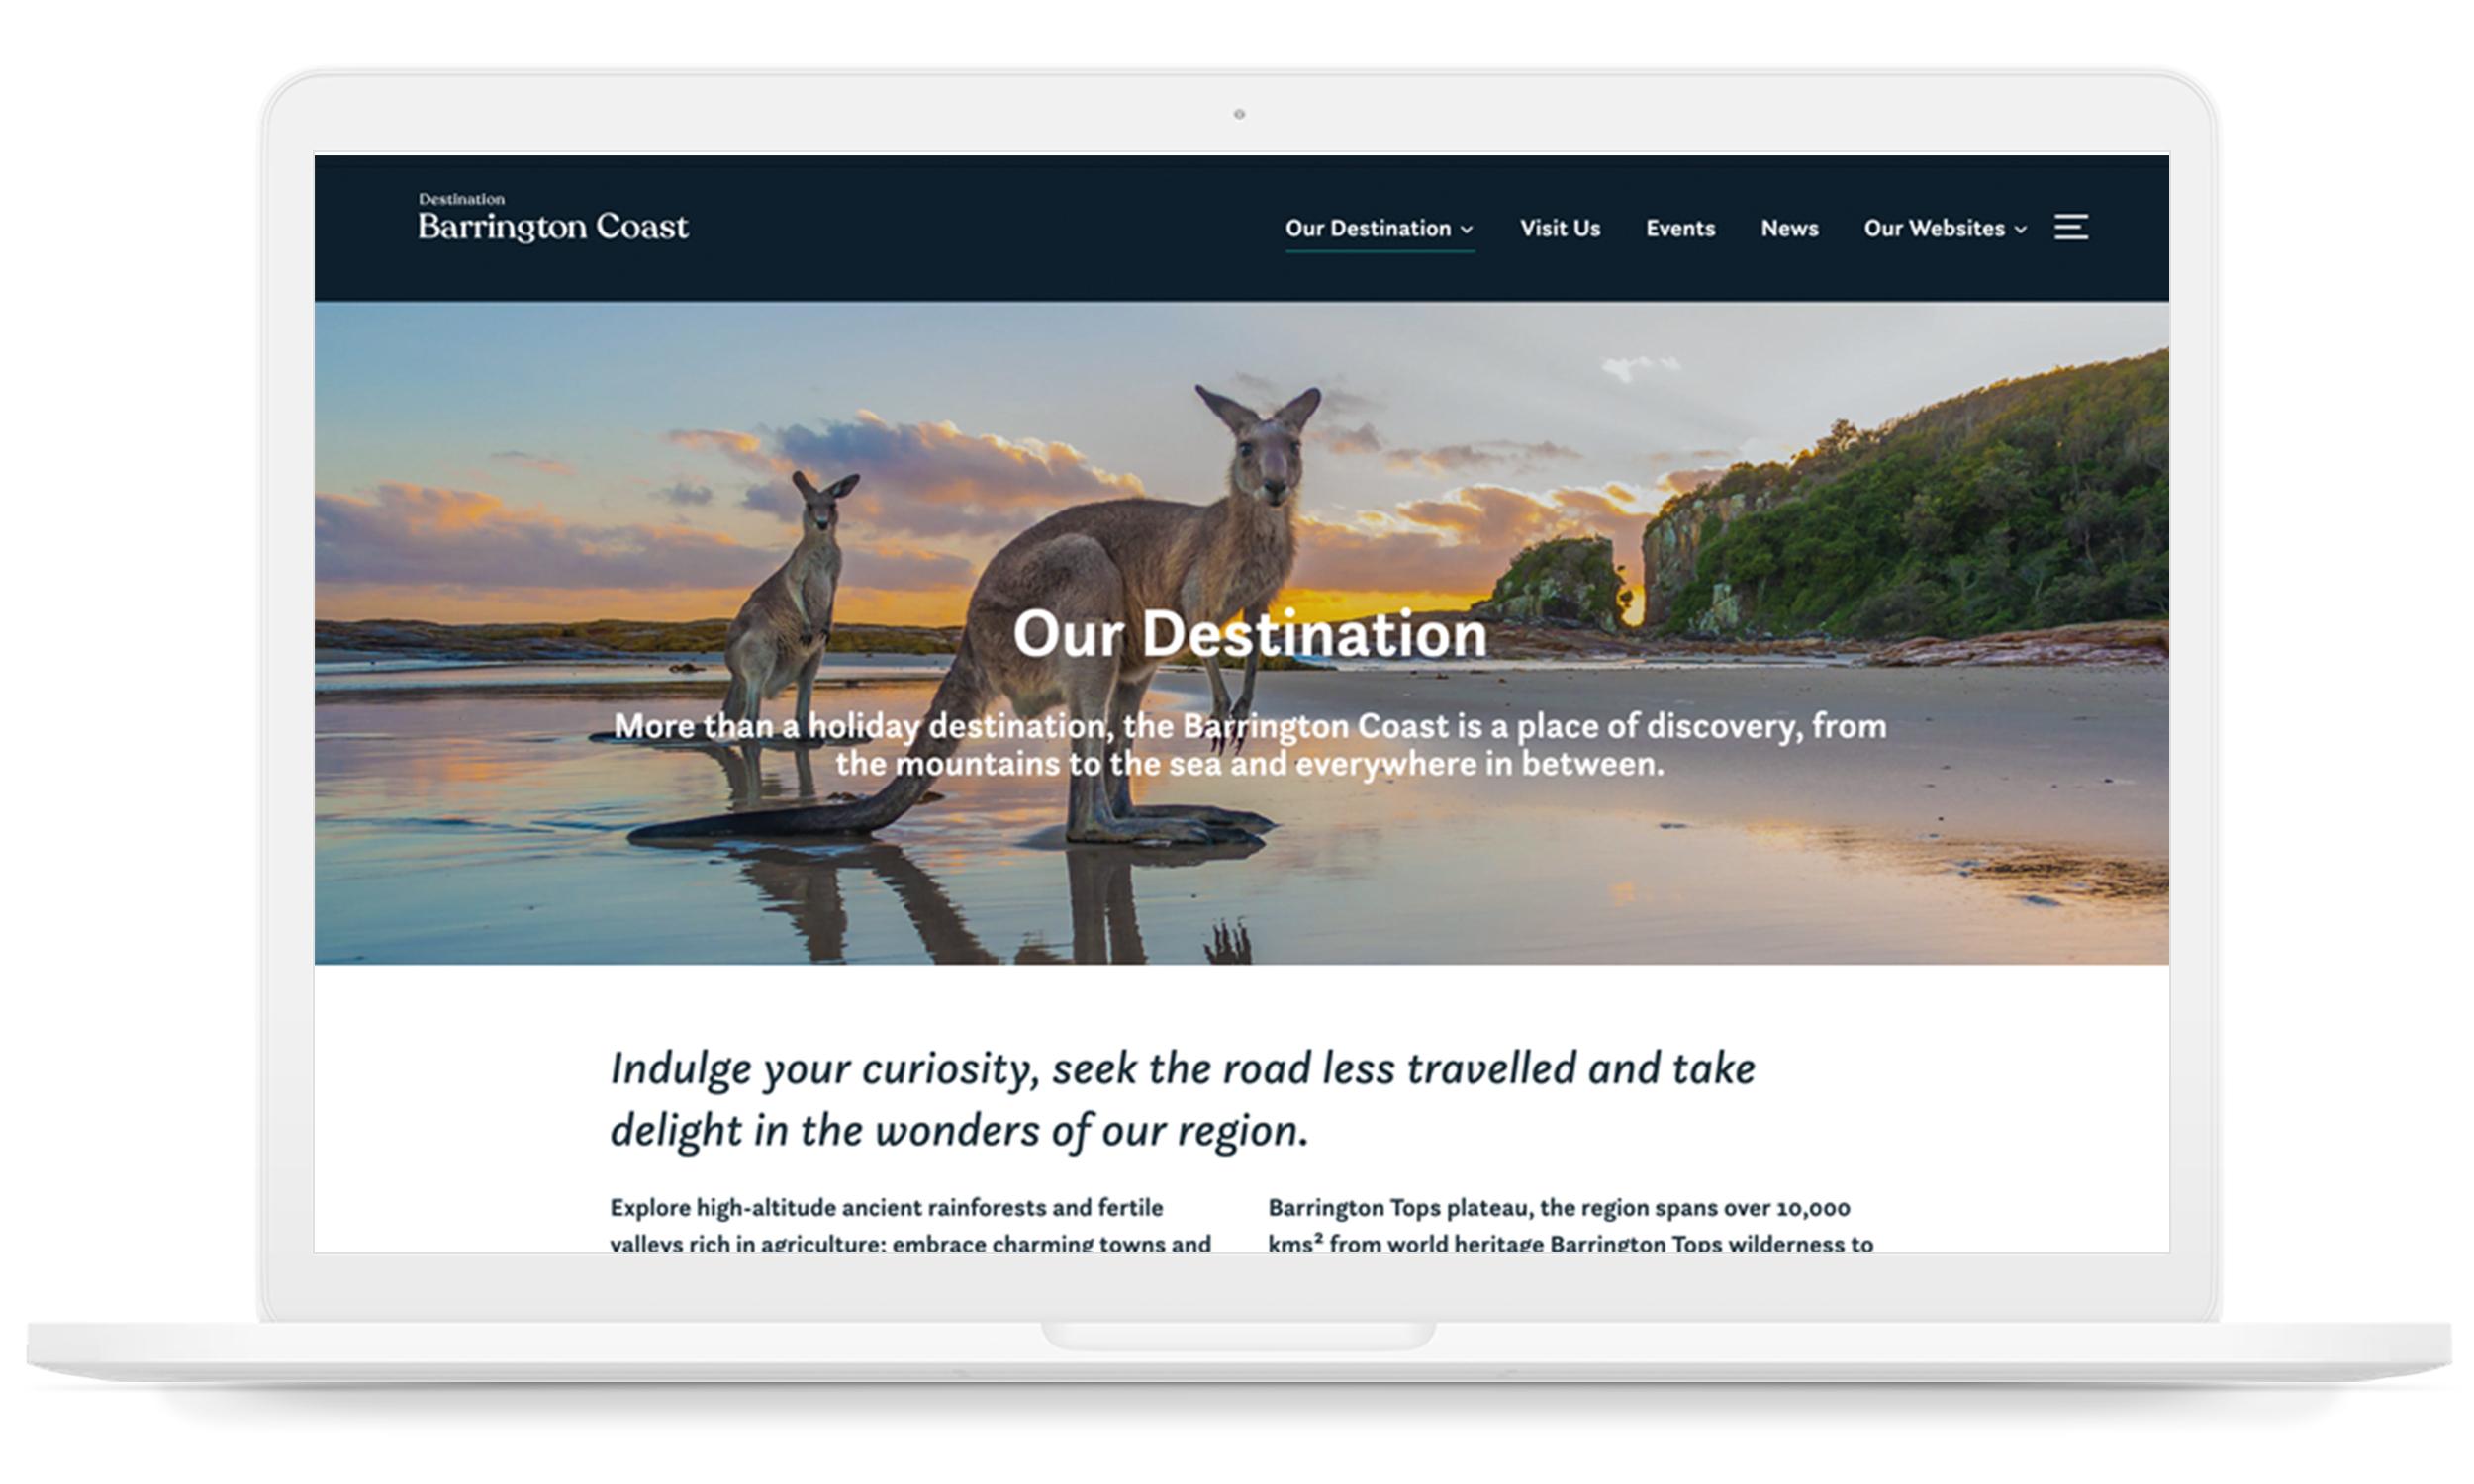 barrington-coast--website-design-heath-and-hoff.jpg